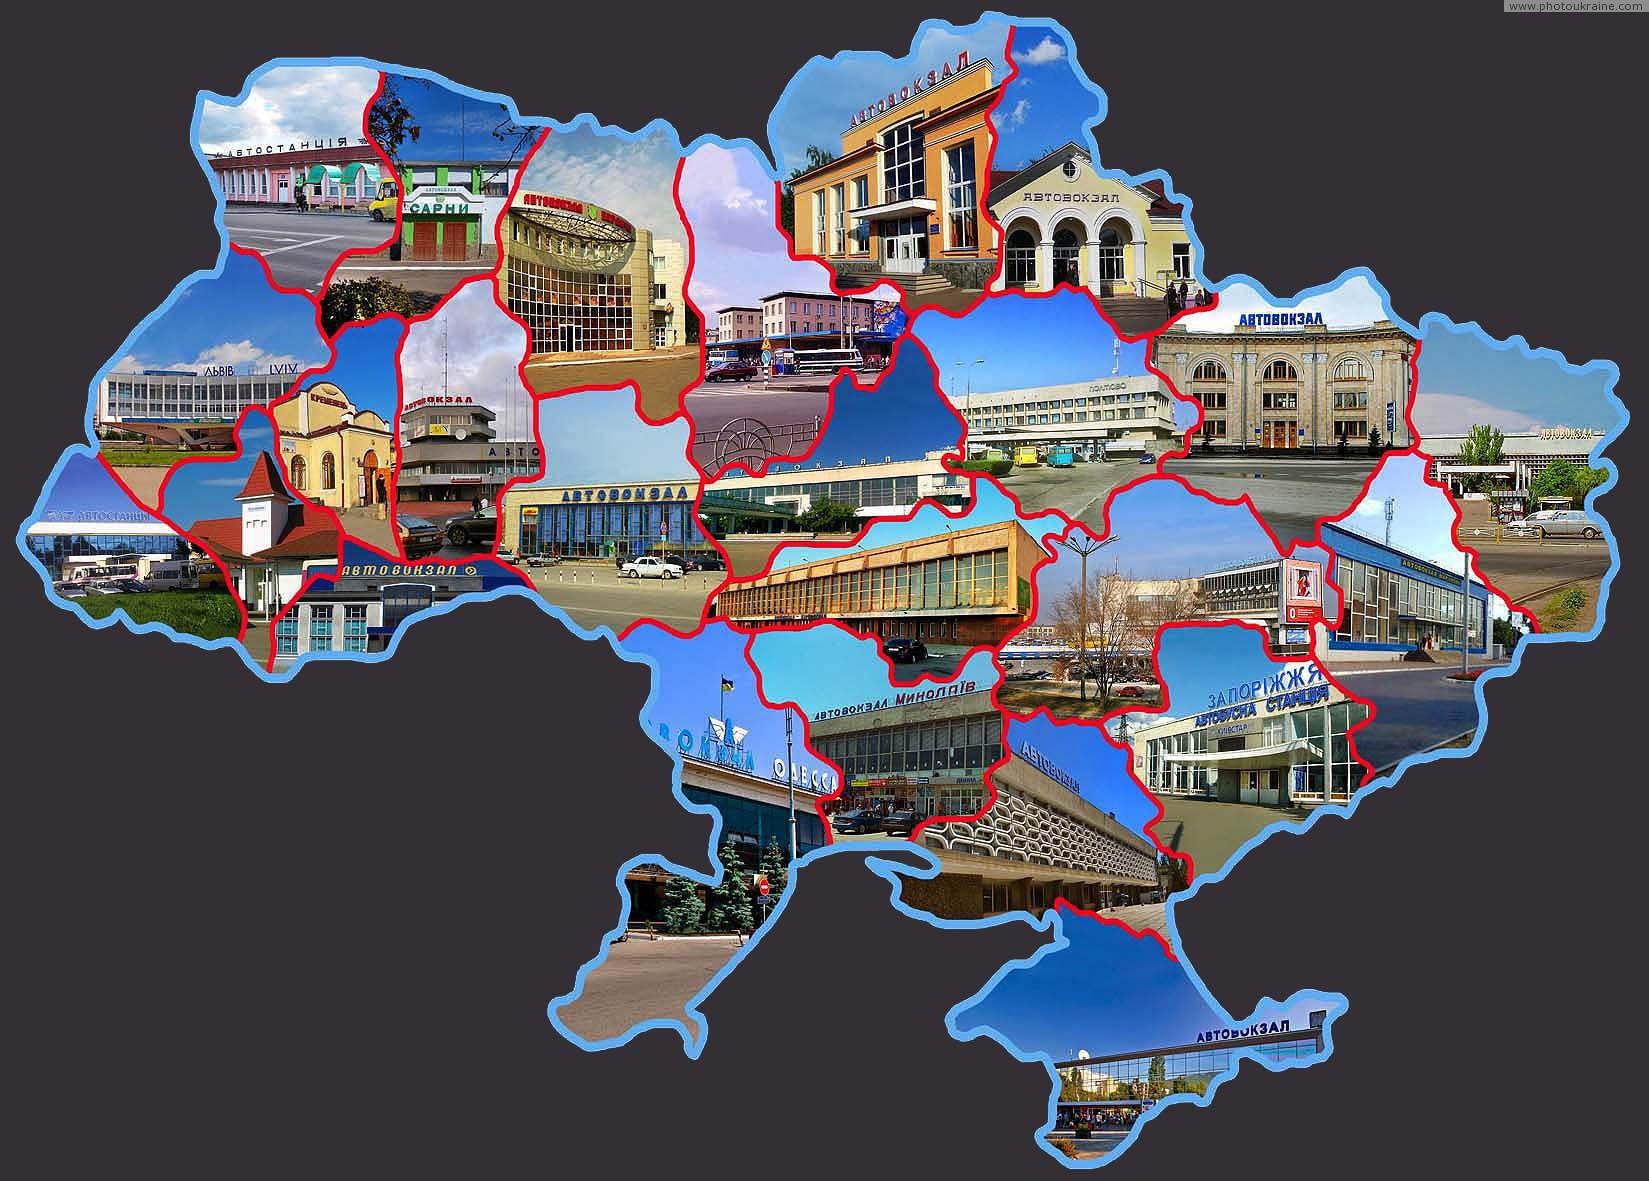 Bus stations of Ukraine